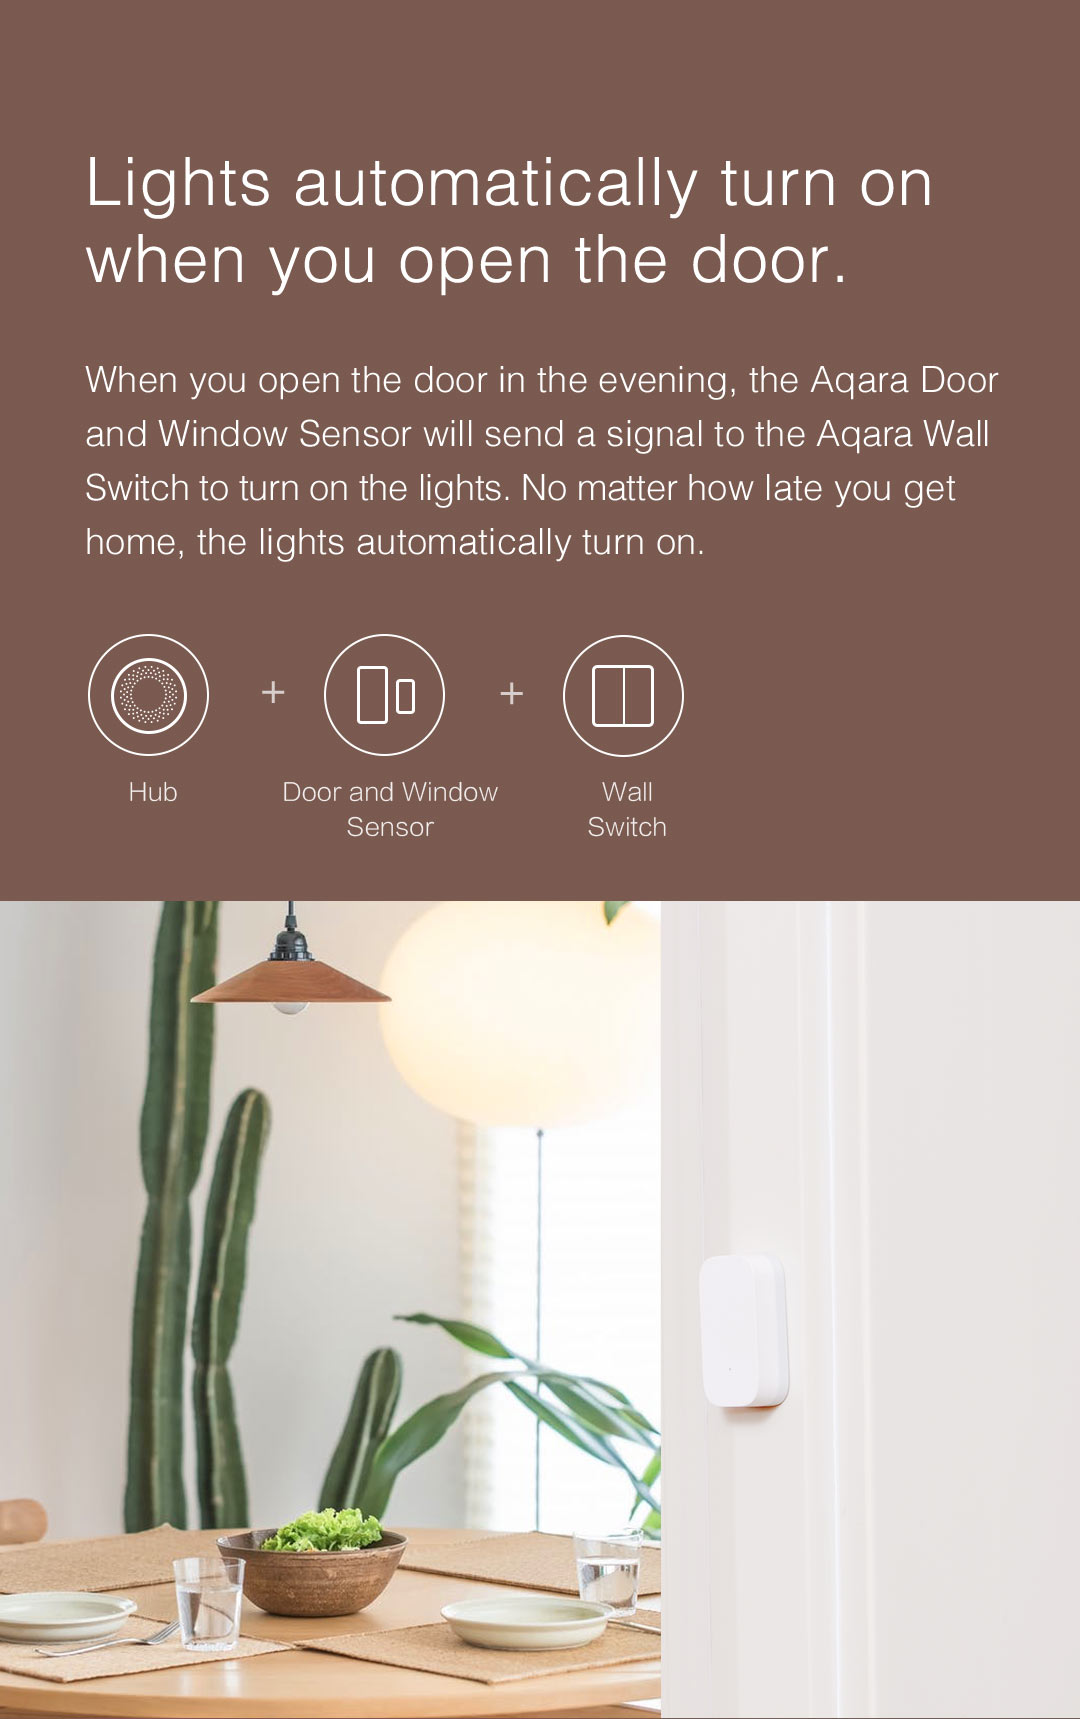 When you open the door in the evening, smart door sensor helps turn on the lights automatically